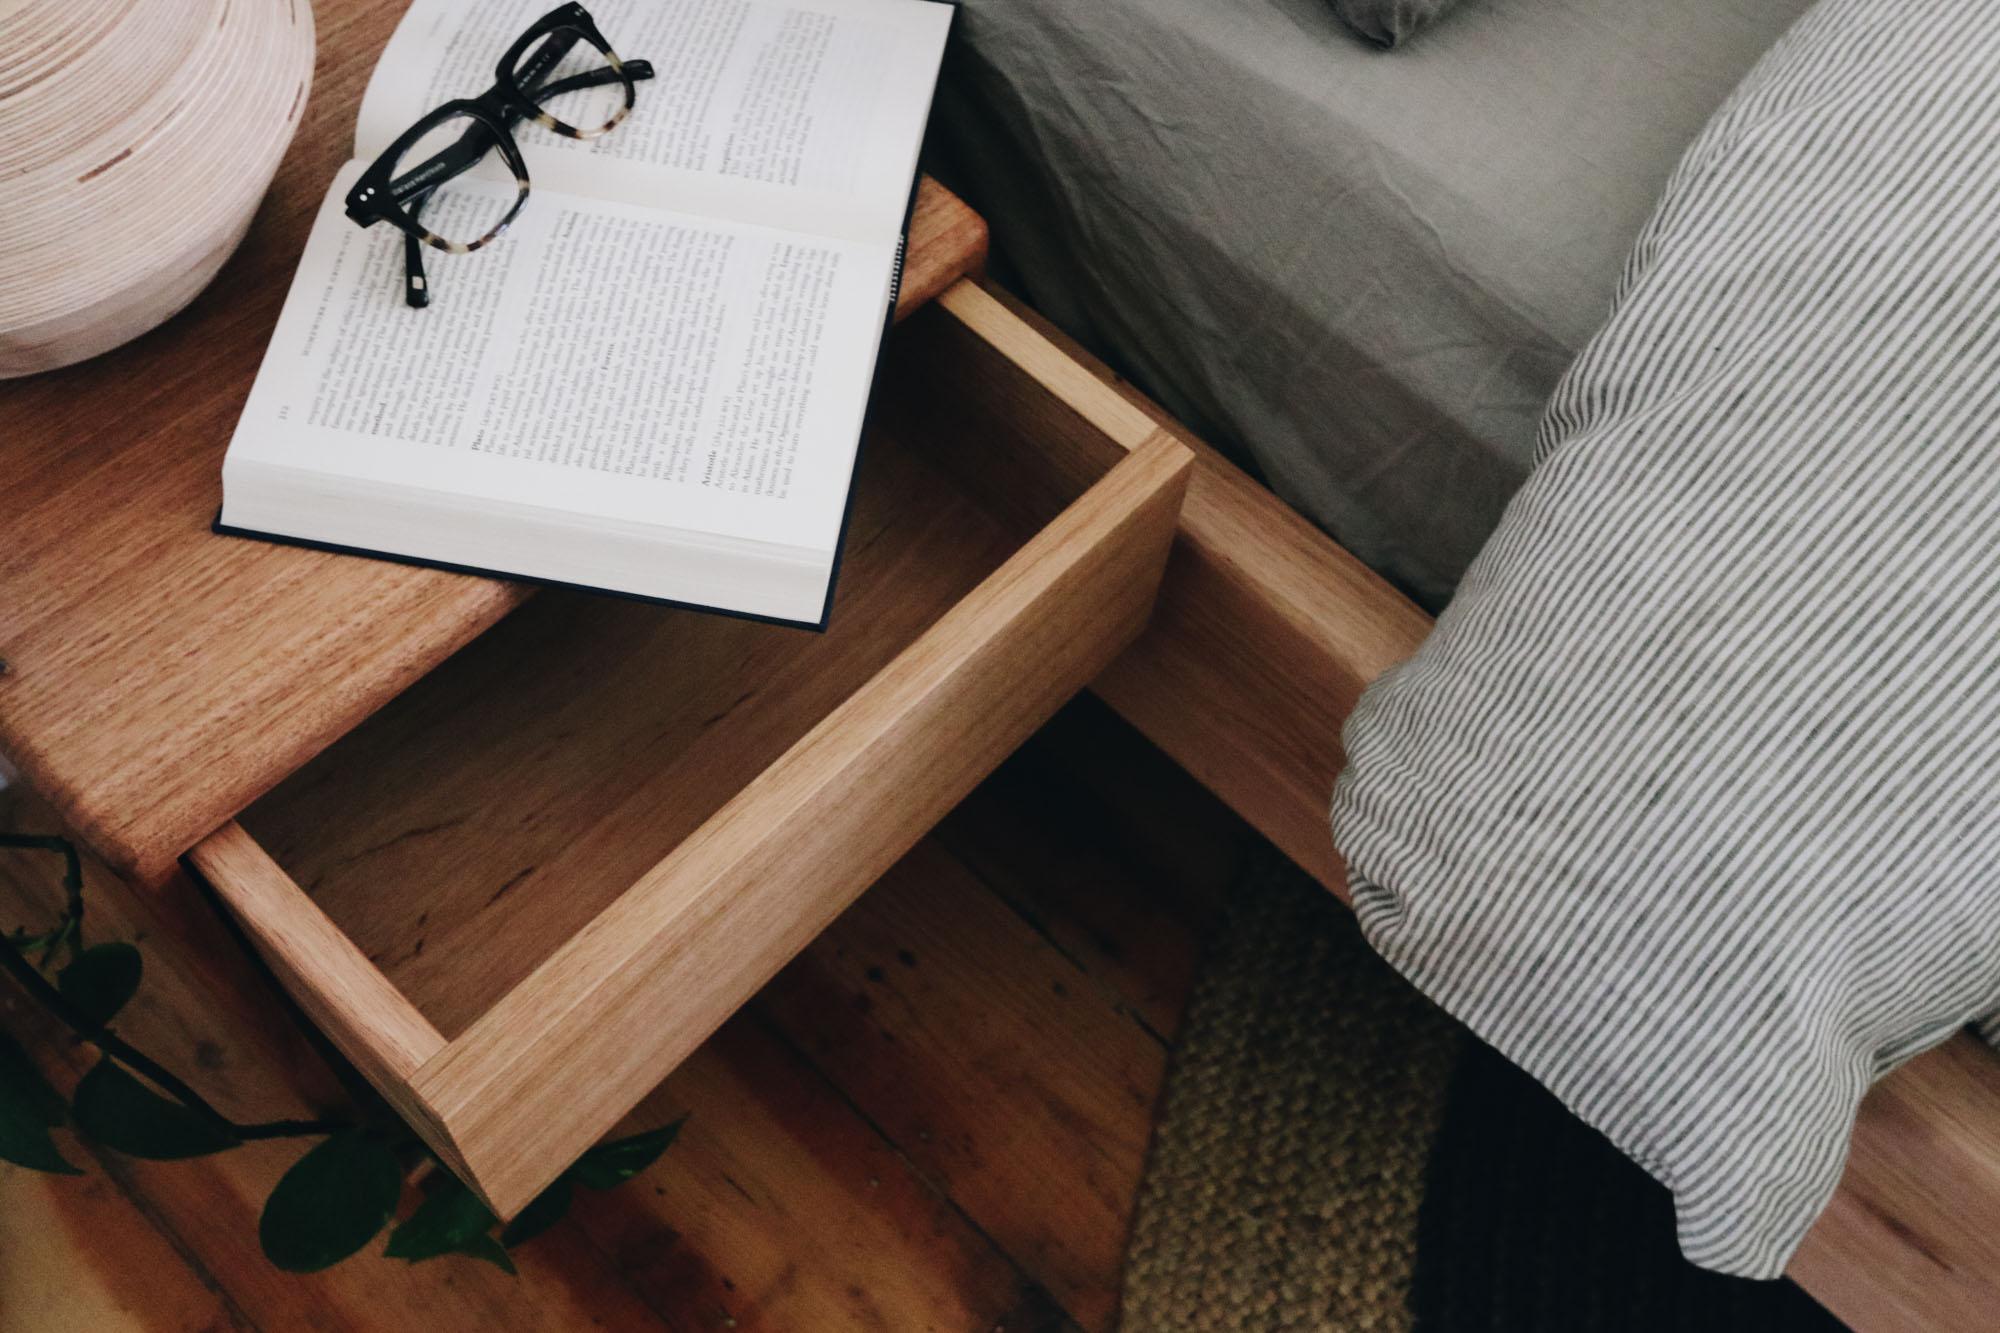 al-and-imo-handmade-simple-minimalist-low-timber-bed-frame-custom-australia-melbourne-19.jpg